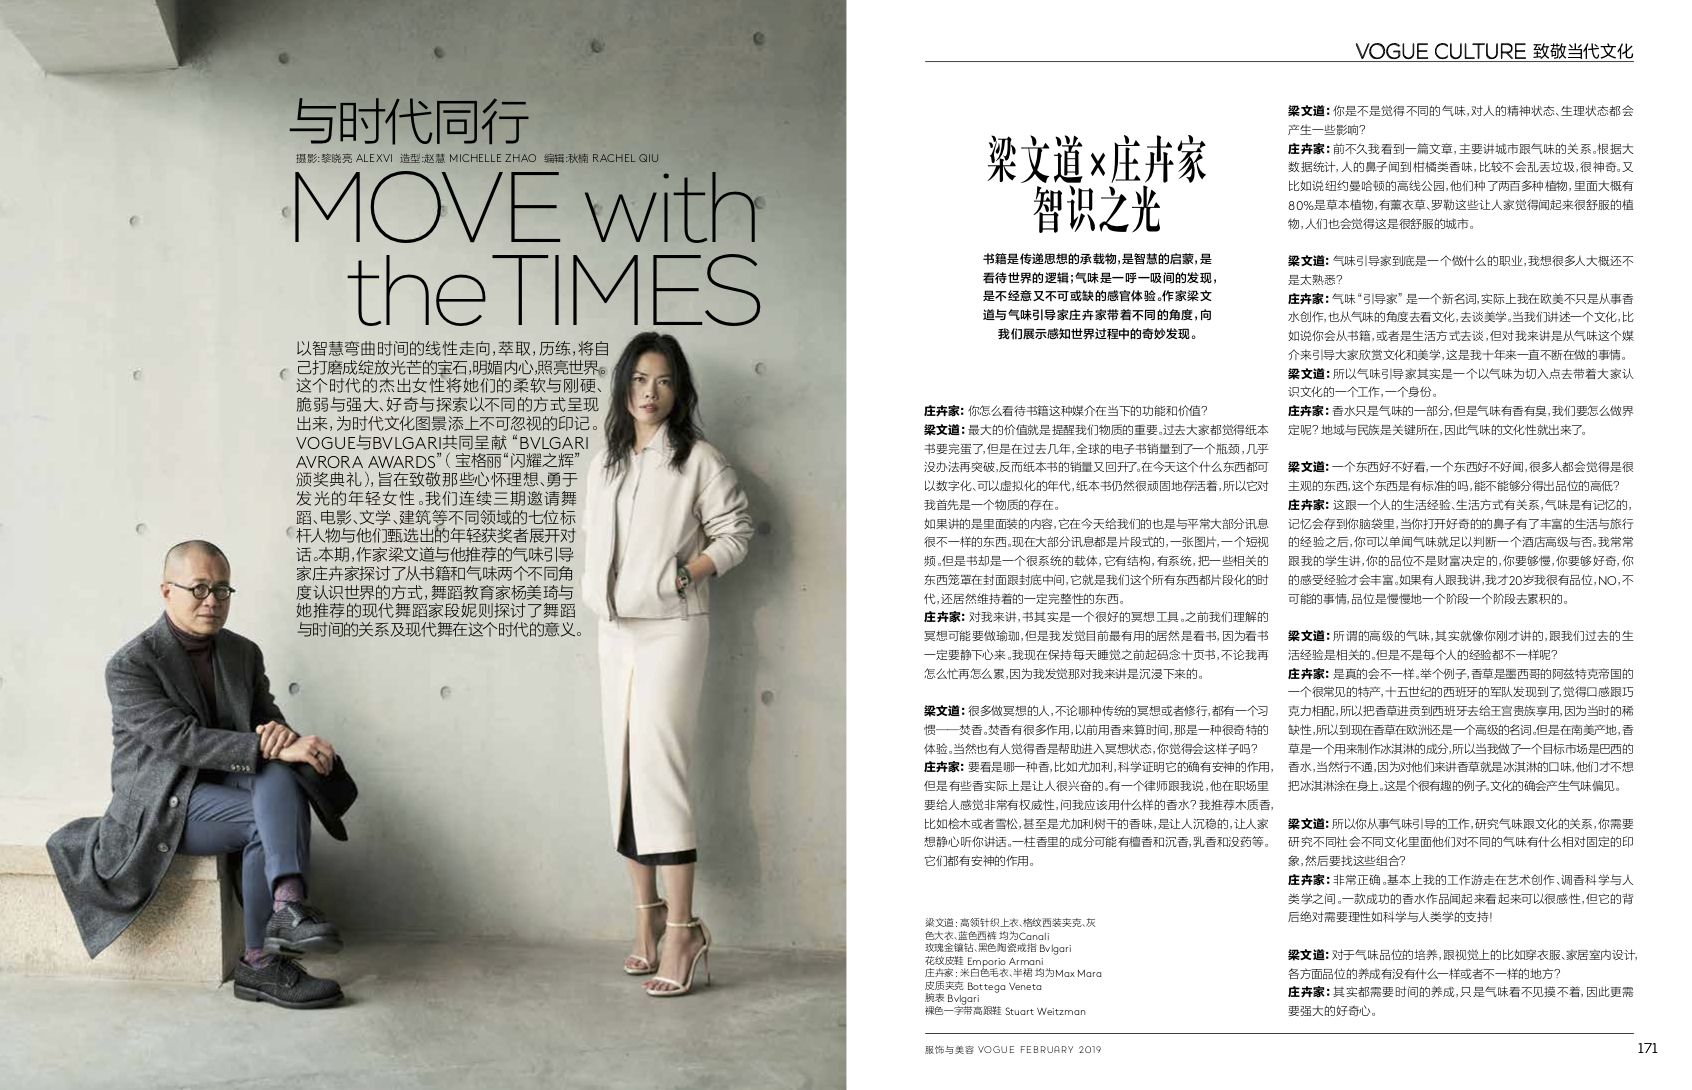 Vogue19_1 copy.jpg